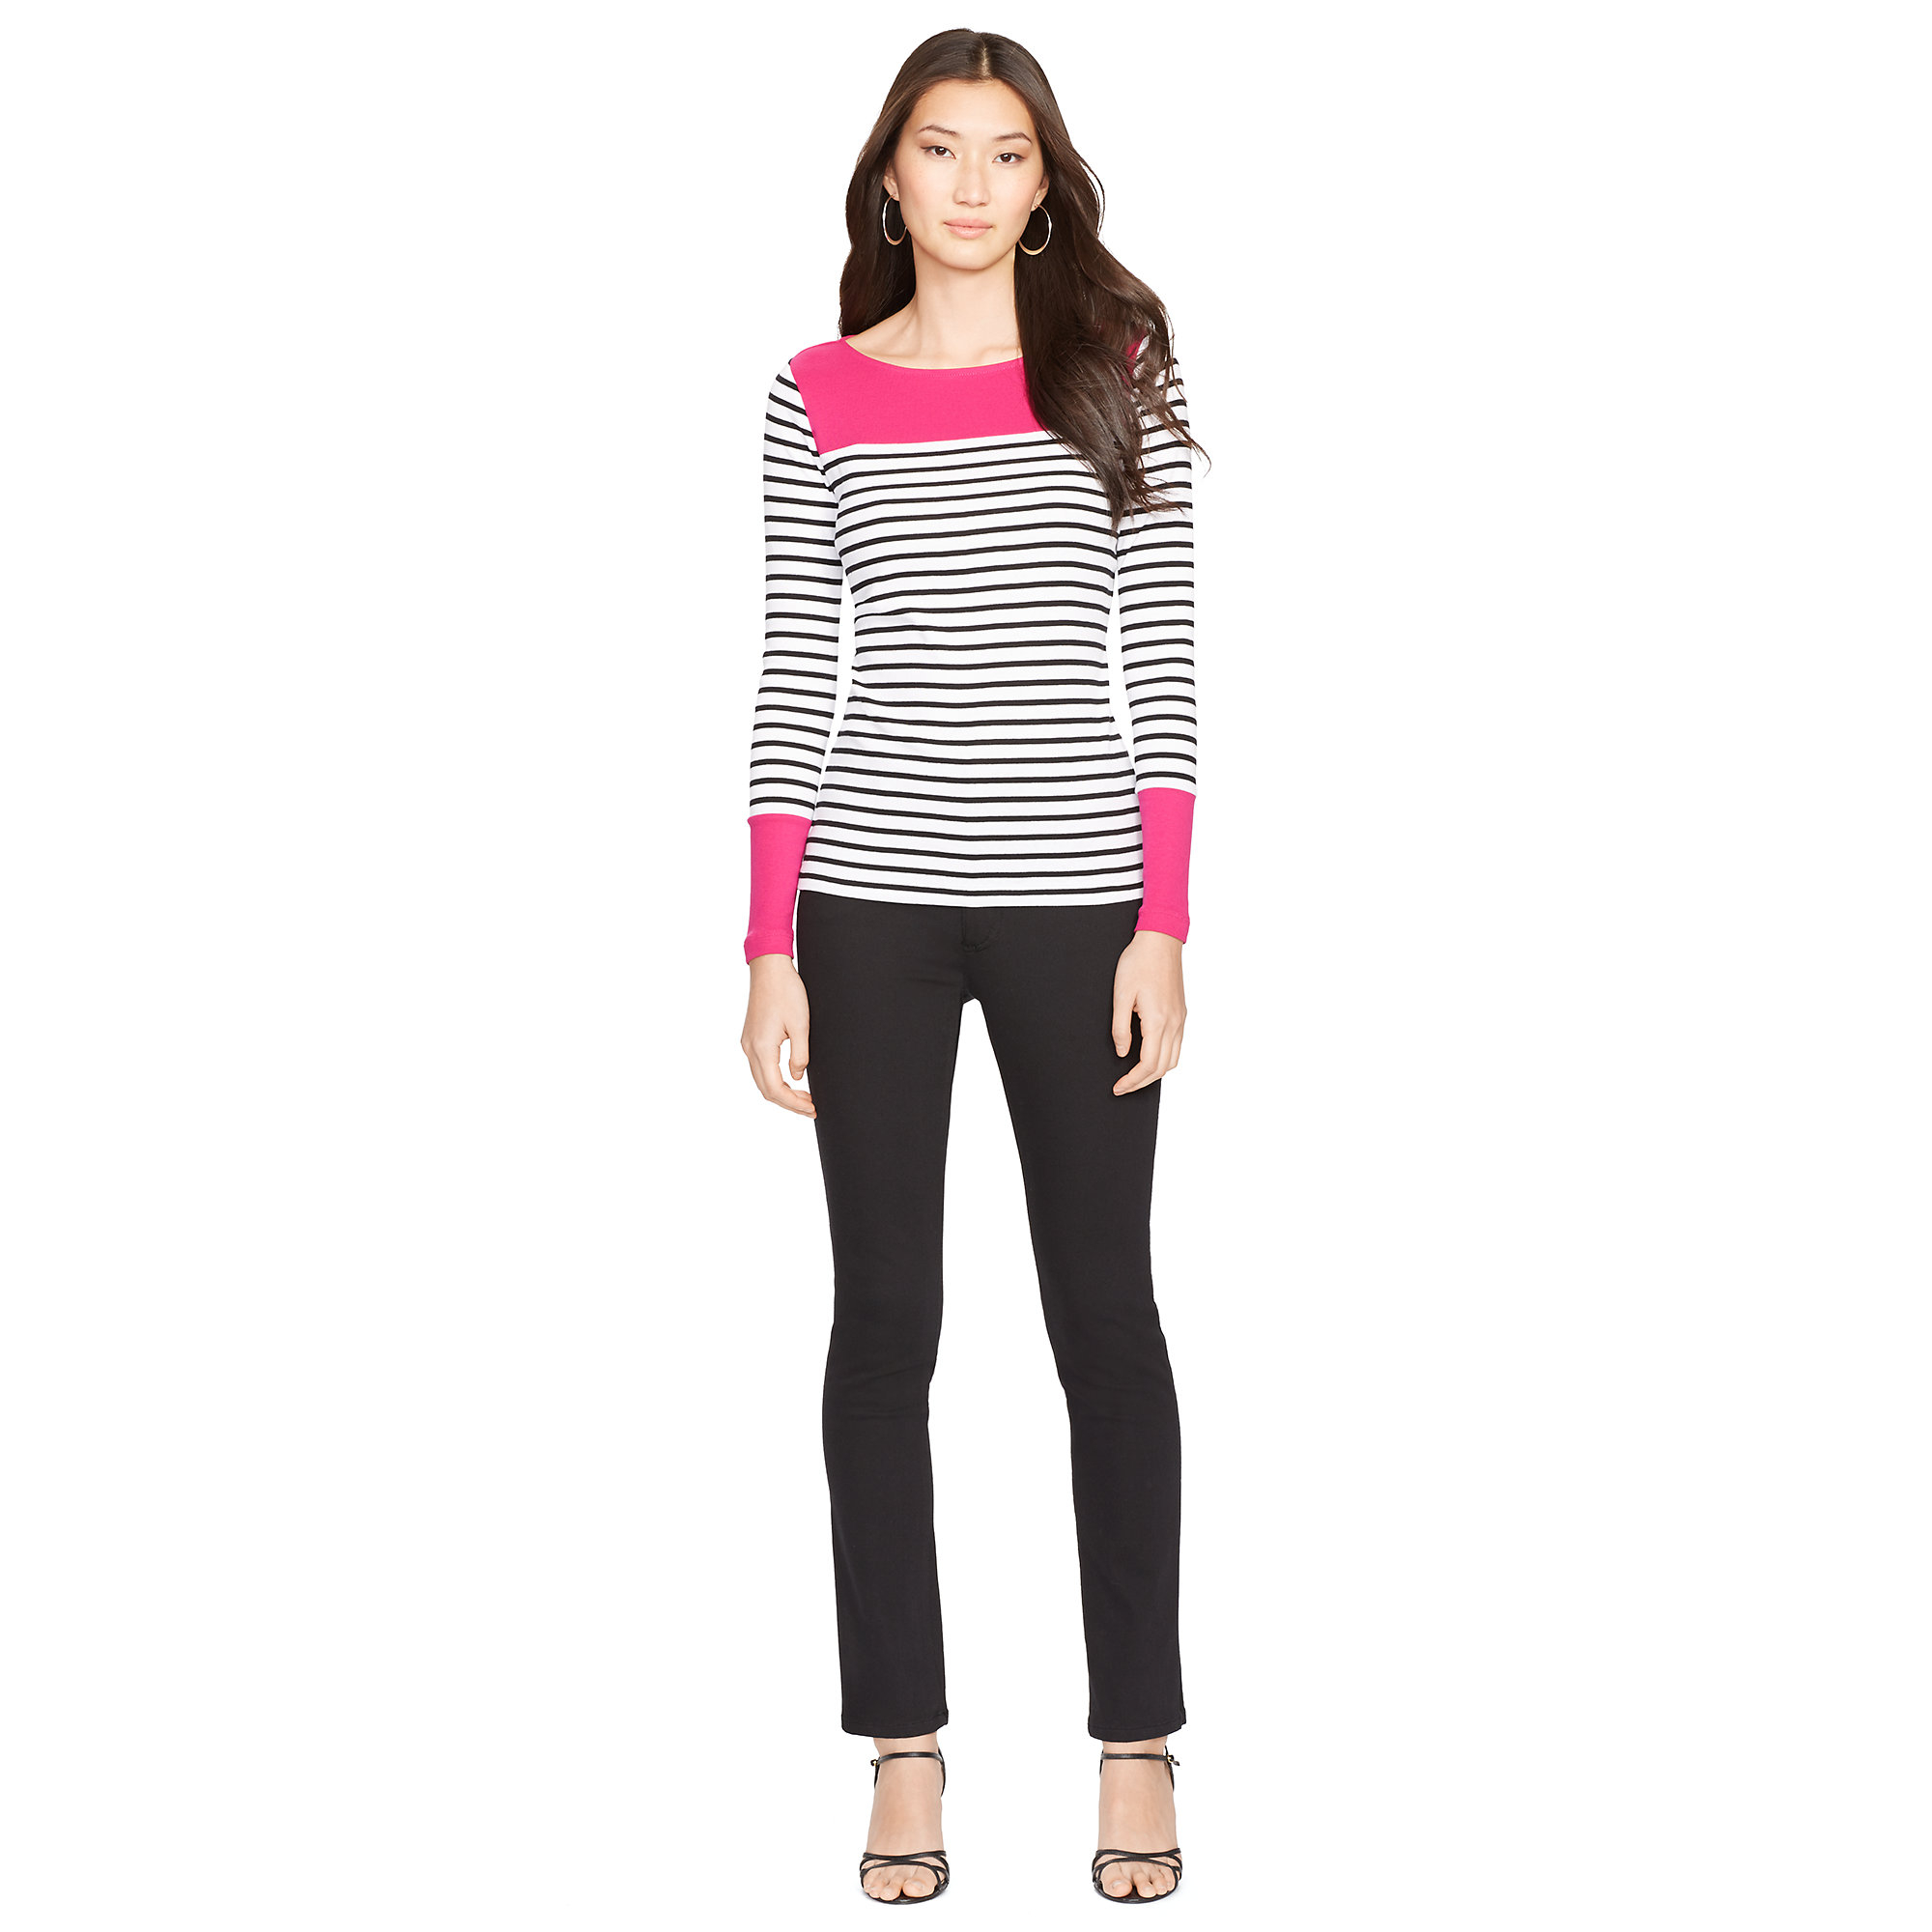 ralph lauren striped ballet neck top in pink white black cruise pink lyst. Black Bedroom Furniture Sets. Home Design Ideas